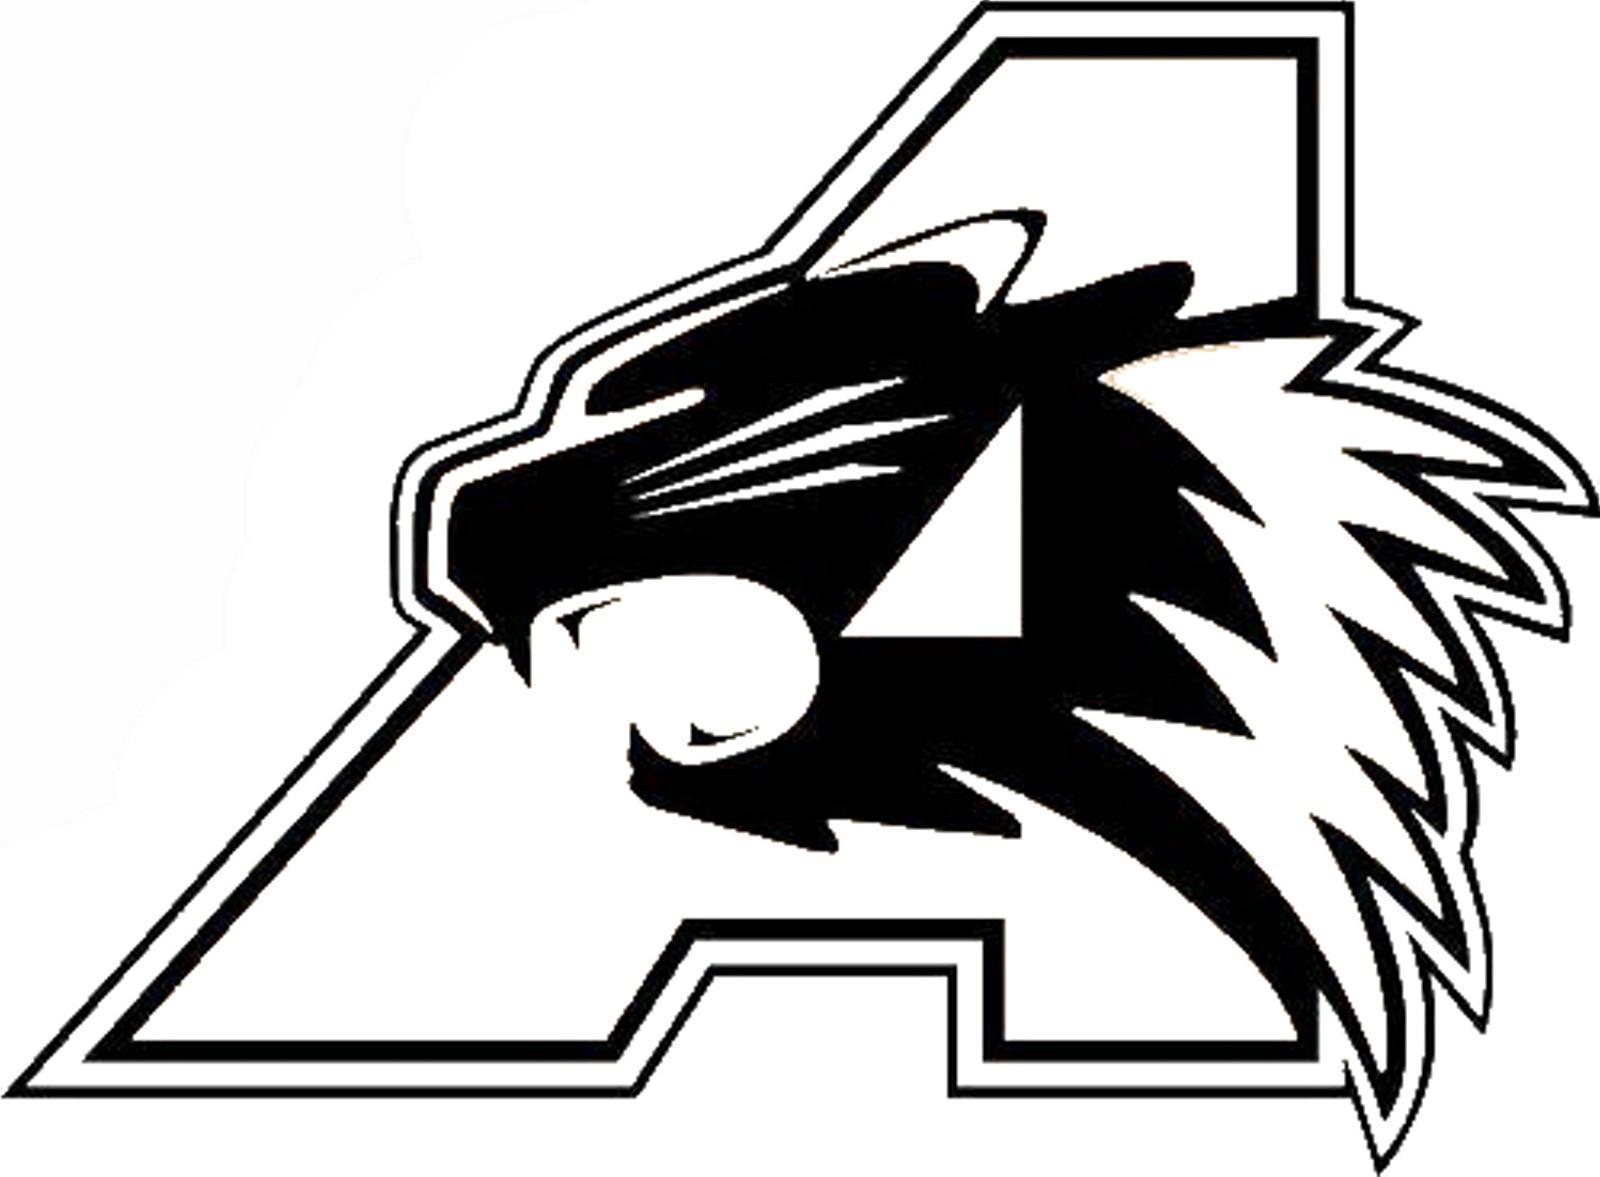 Aledo bearcat clipart svg freeuse Aledo Bearcats Texas High School Football and 50 similar items svg freeuse